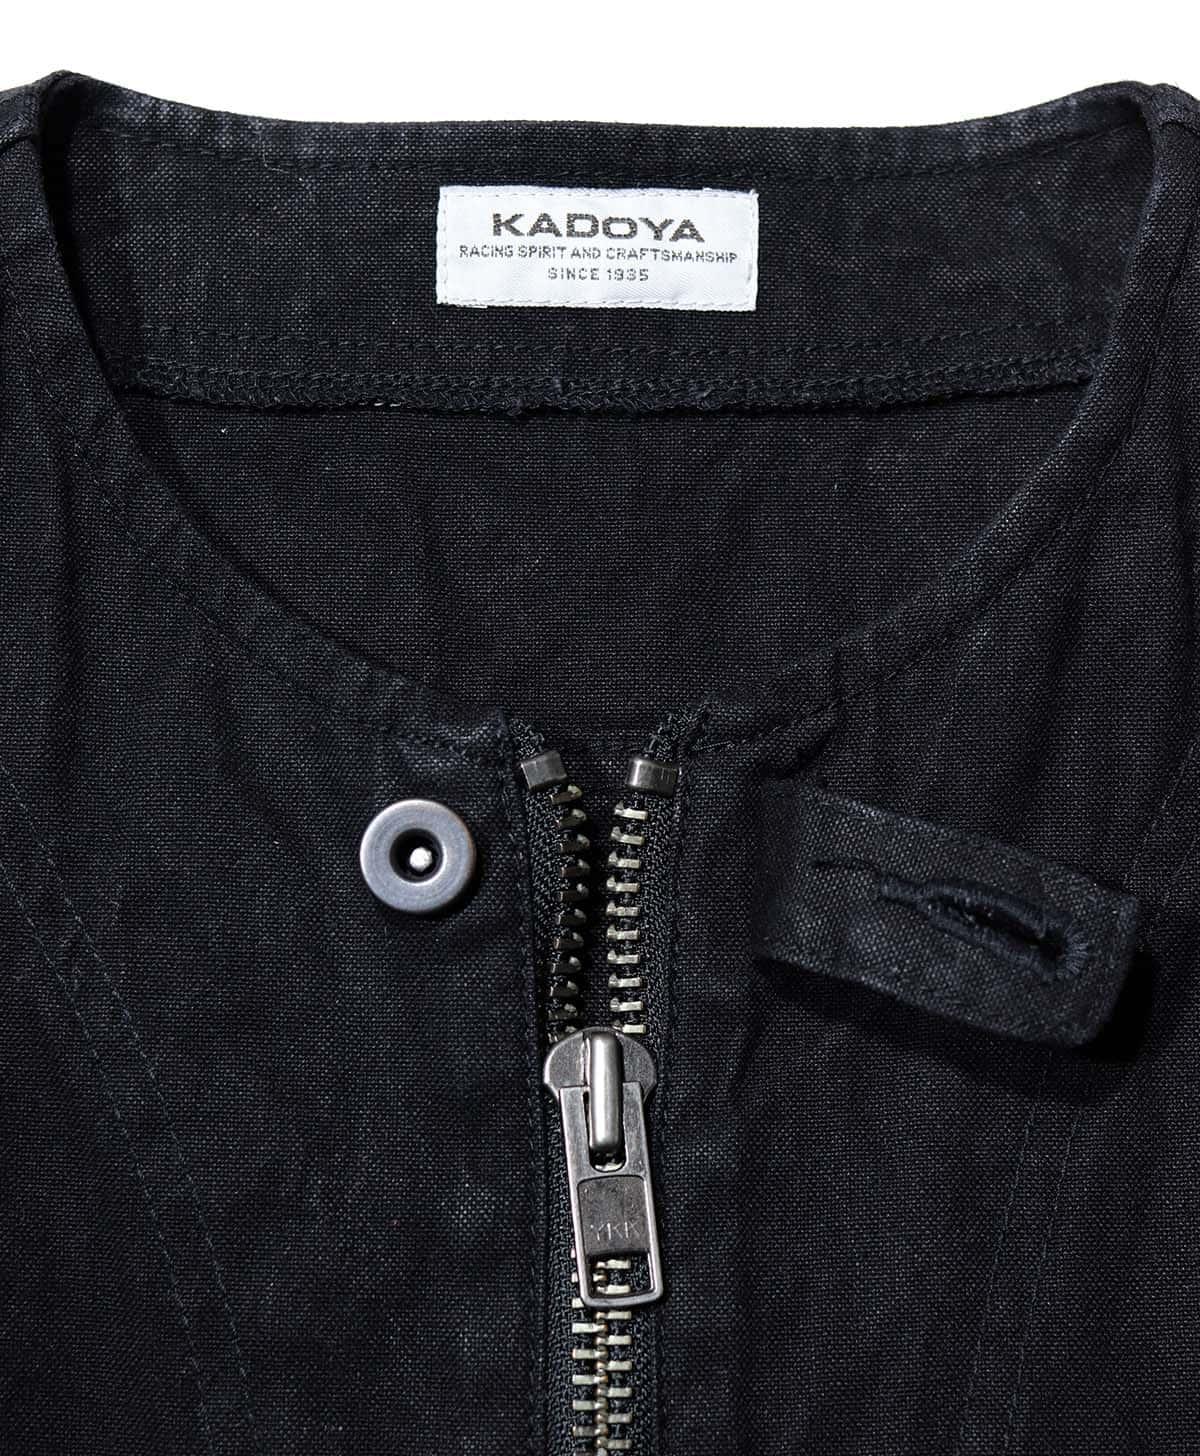 KADOYA(カドヤ) RIDERS WORK VEST ライダースワークベスト ダック生地ベスト ブラック 日本製